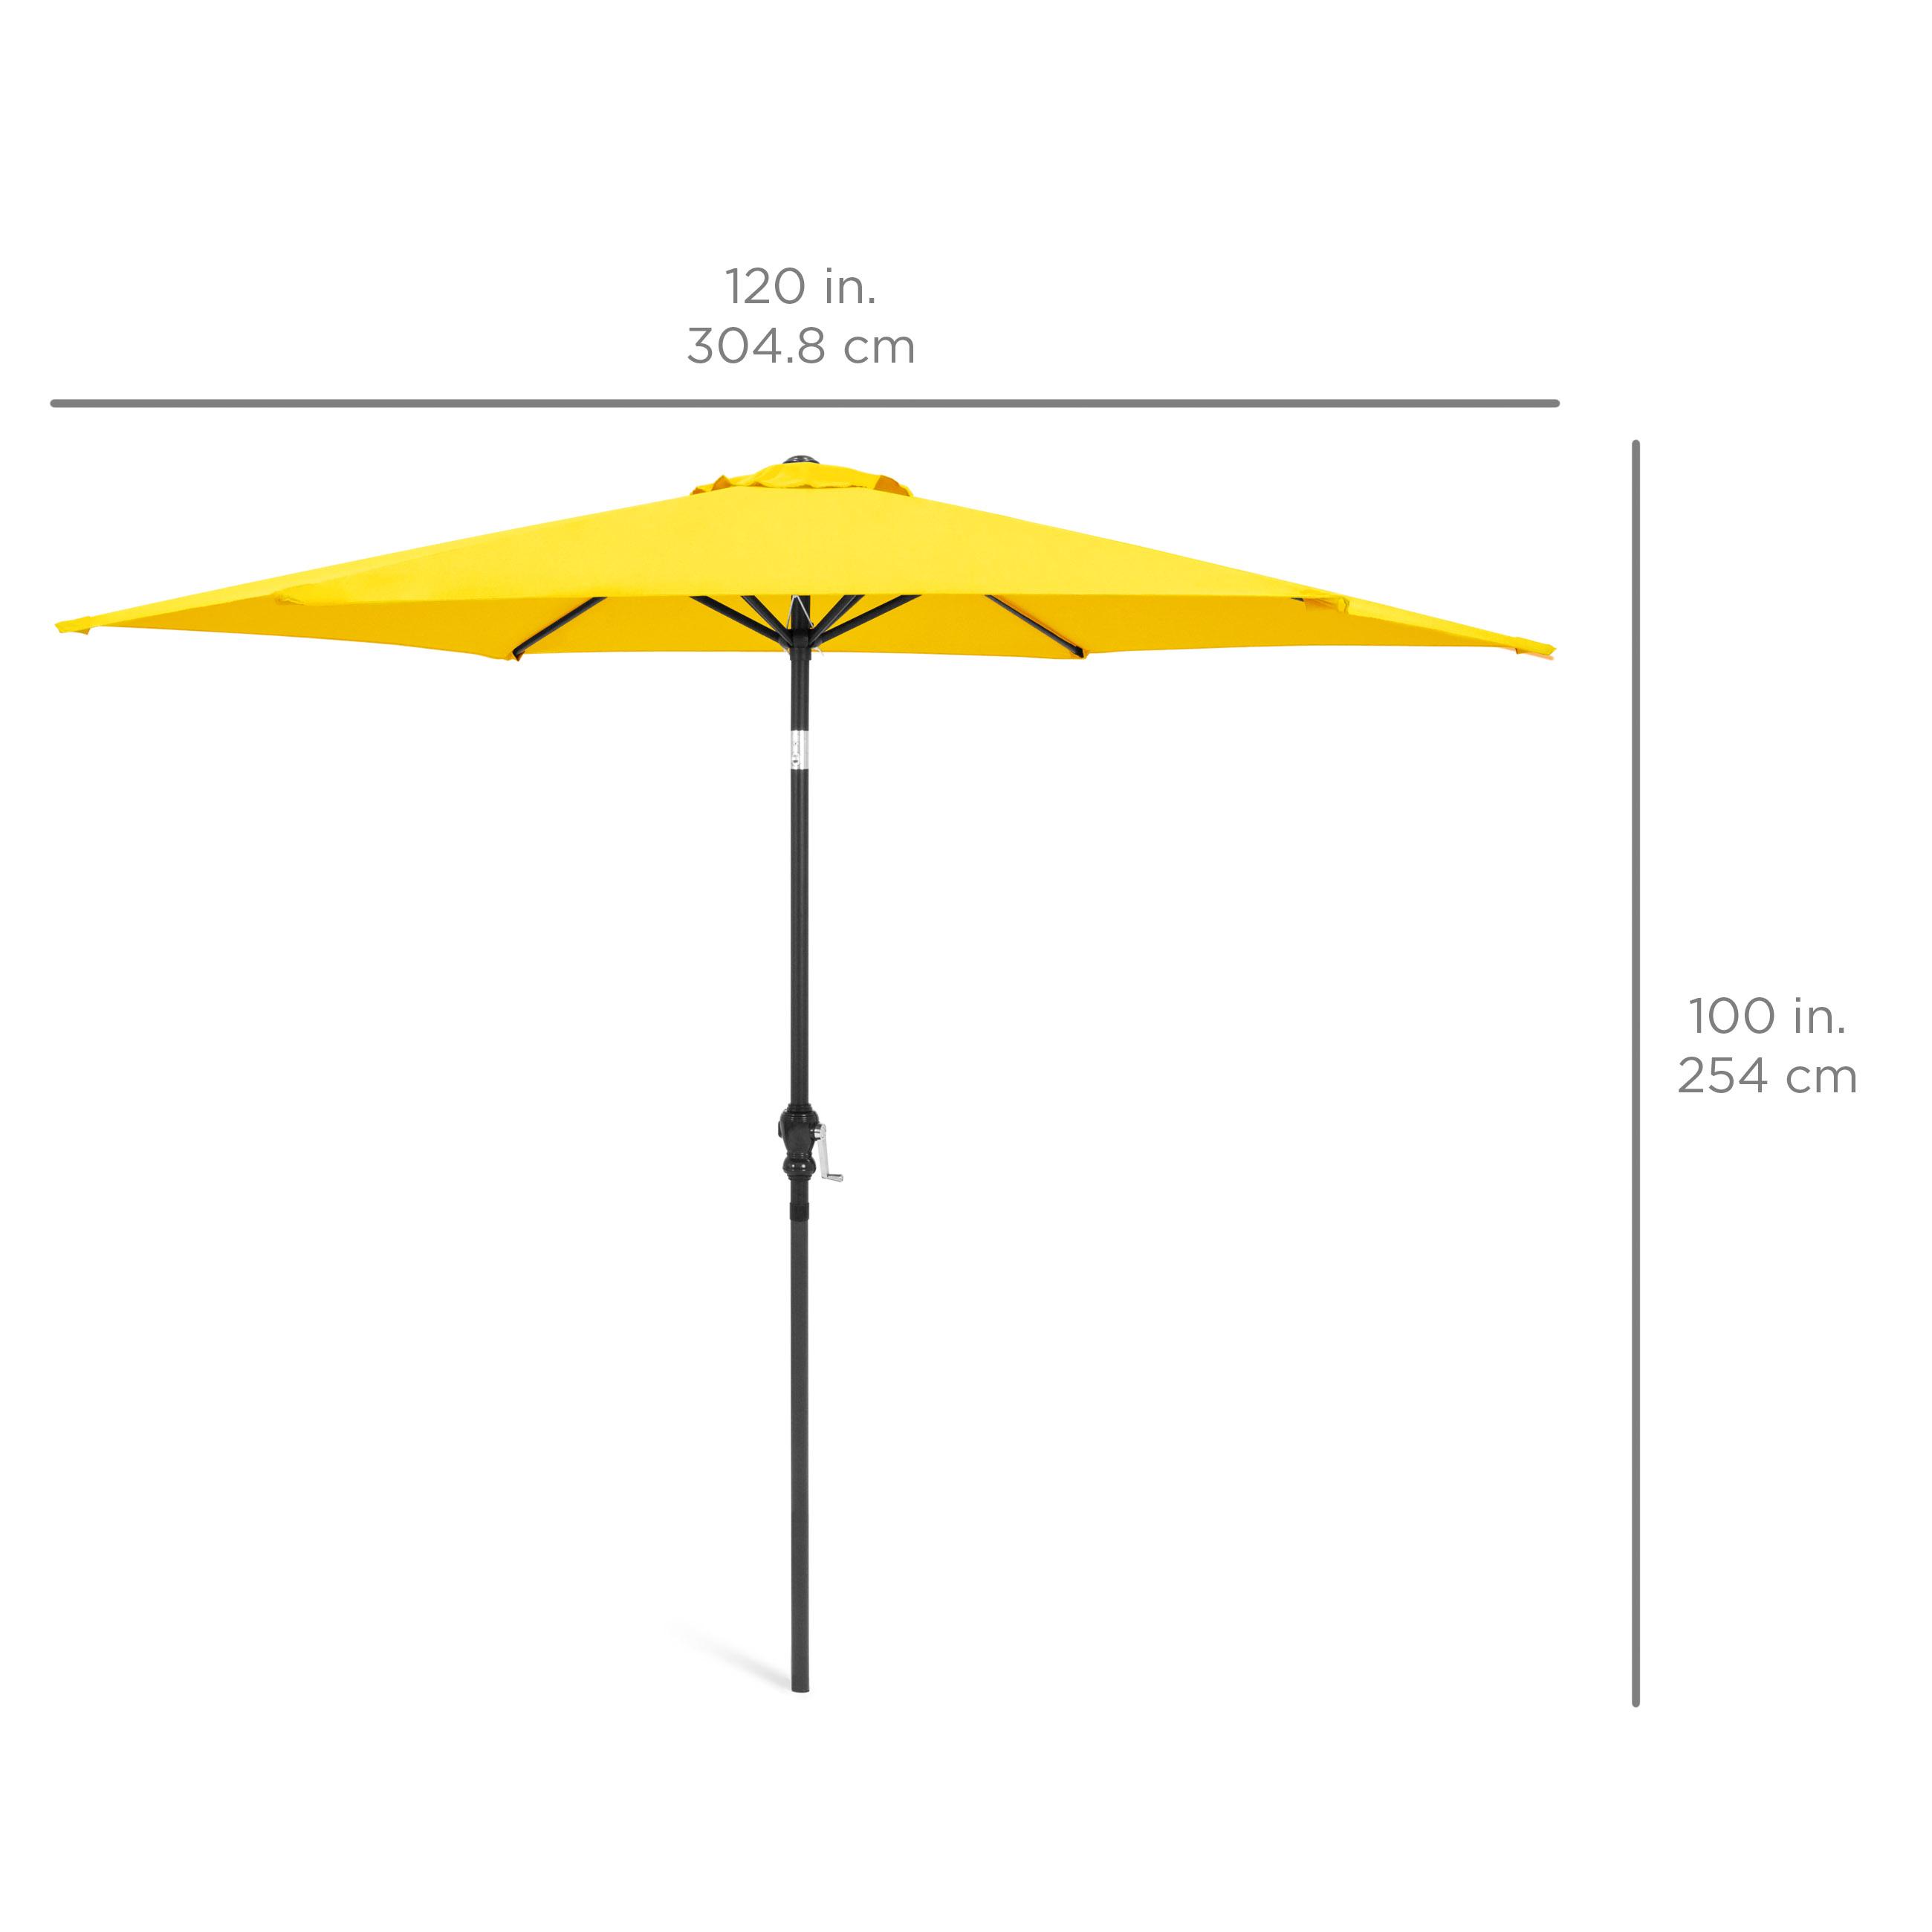 BCP-10ft-Outdoor-Steel-Market-Patio-Umbrella-Decoration-w-Tilt-Crank thumbnail 70